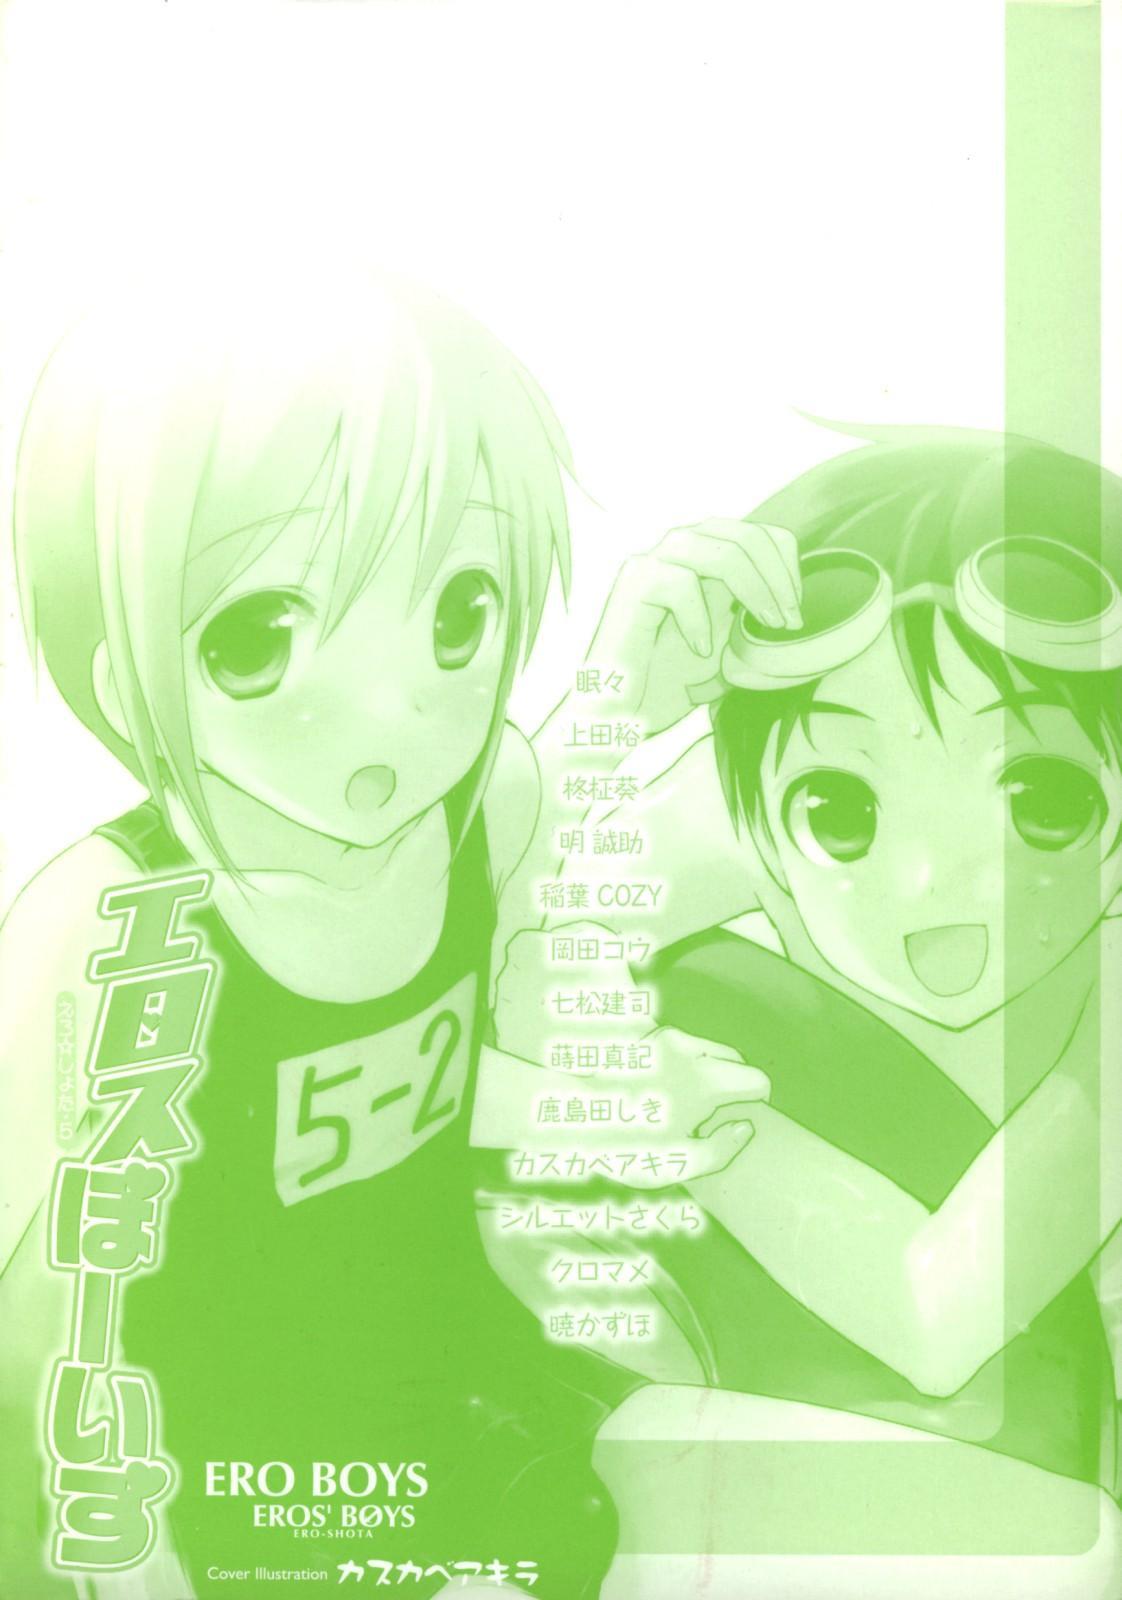 Eros Boys - Ero Shota 5 3